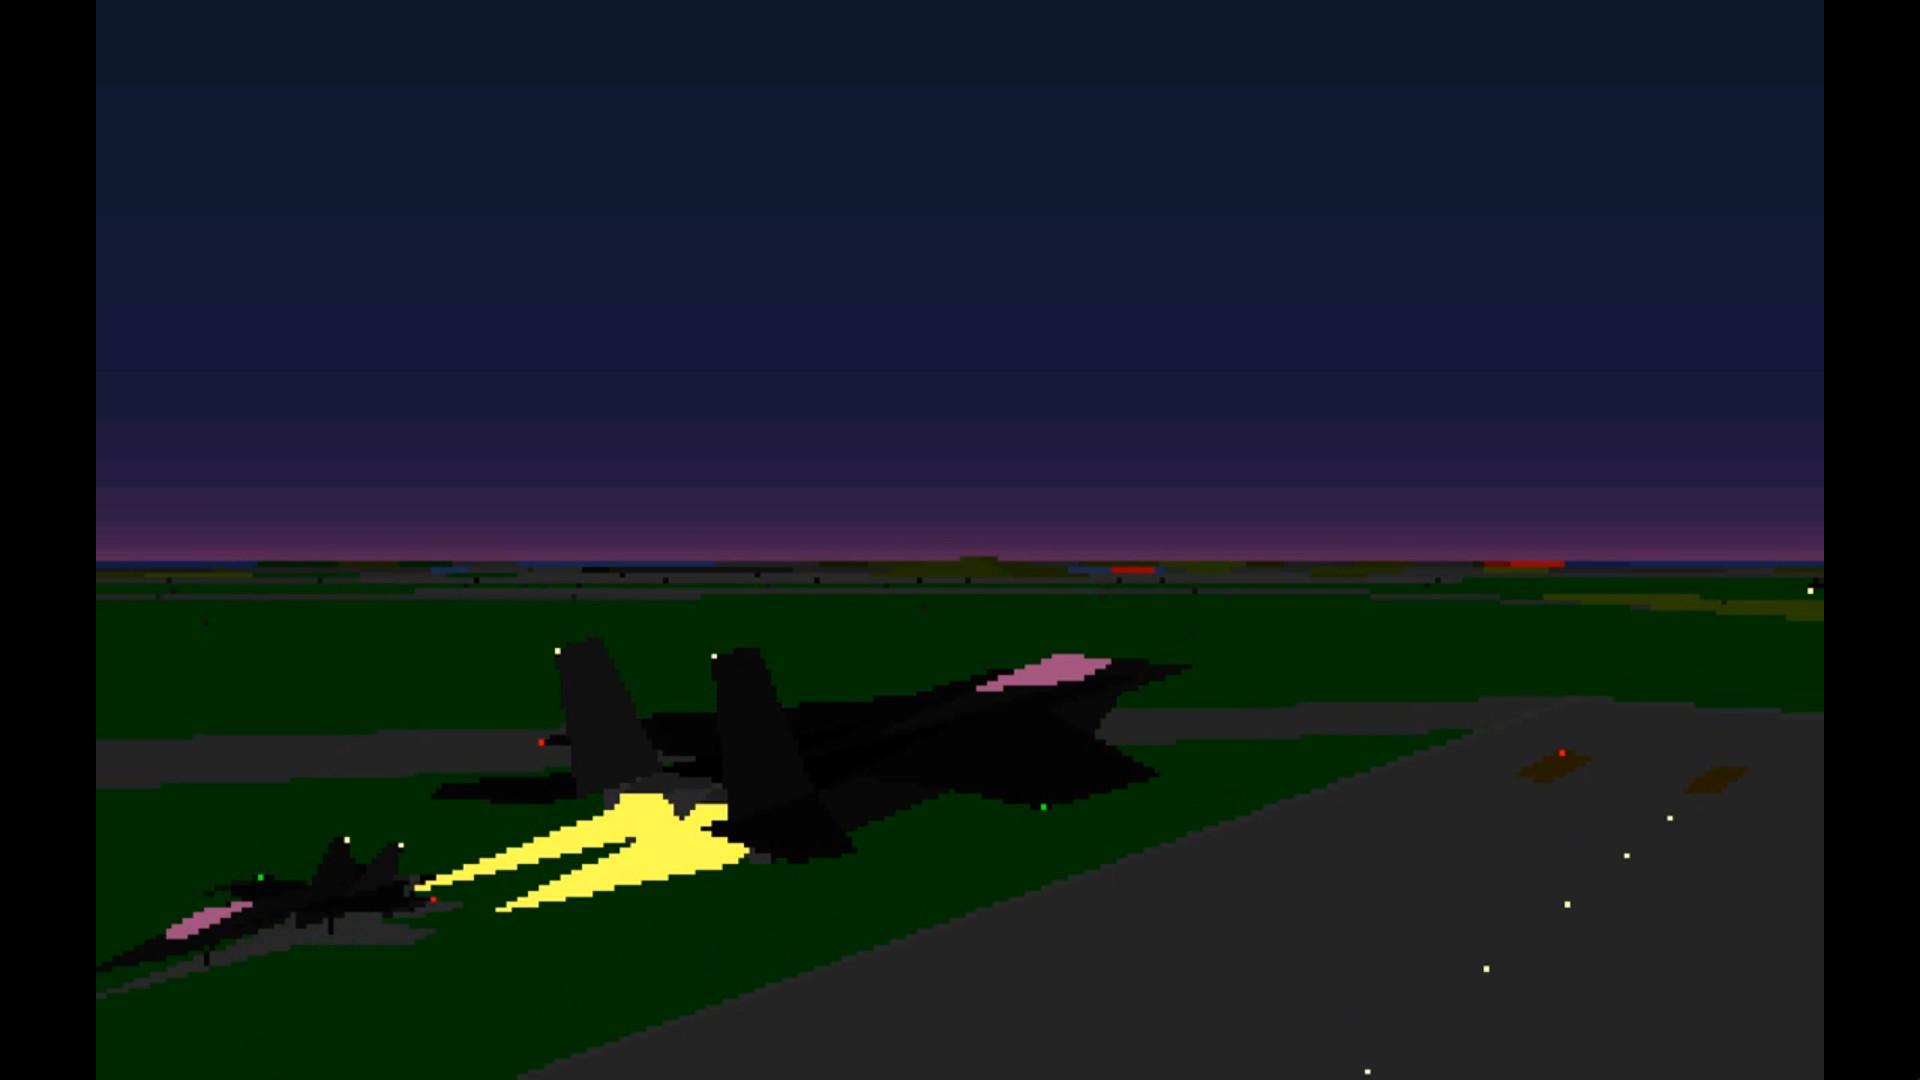 F-117A Nighthawk Stealth Fighter 2.0 Captura 2